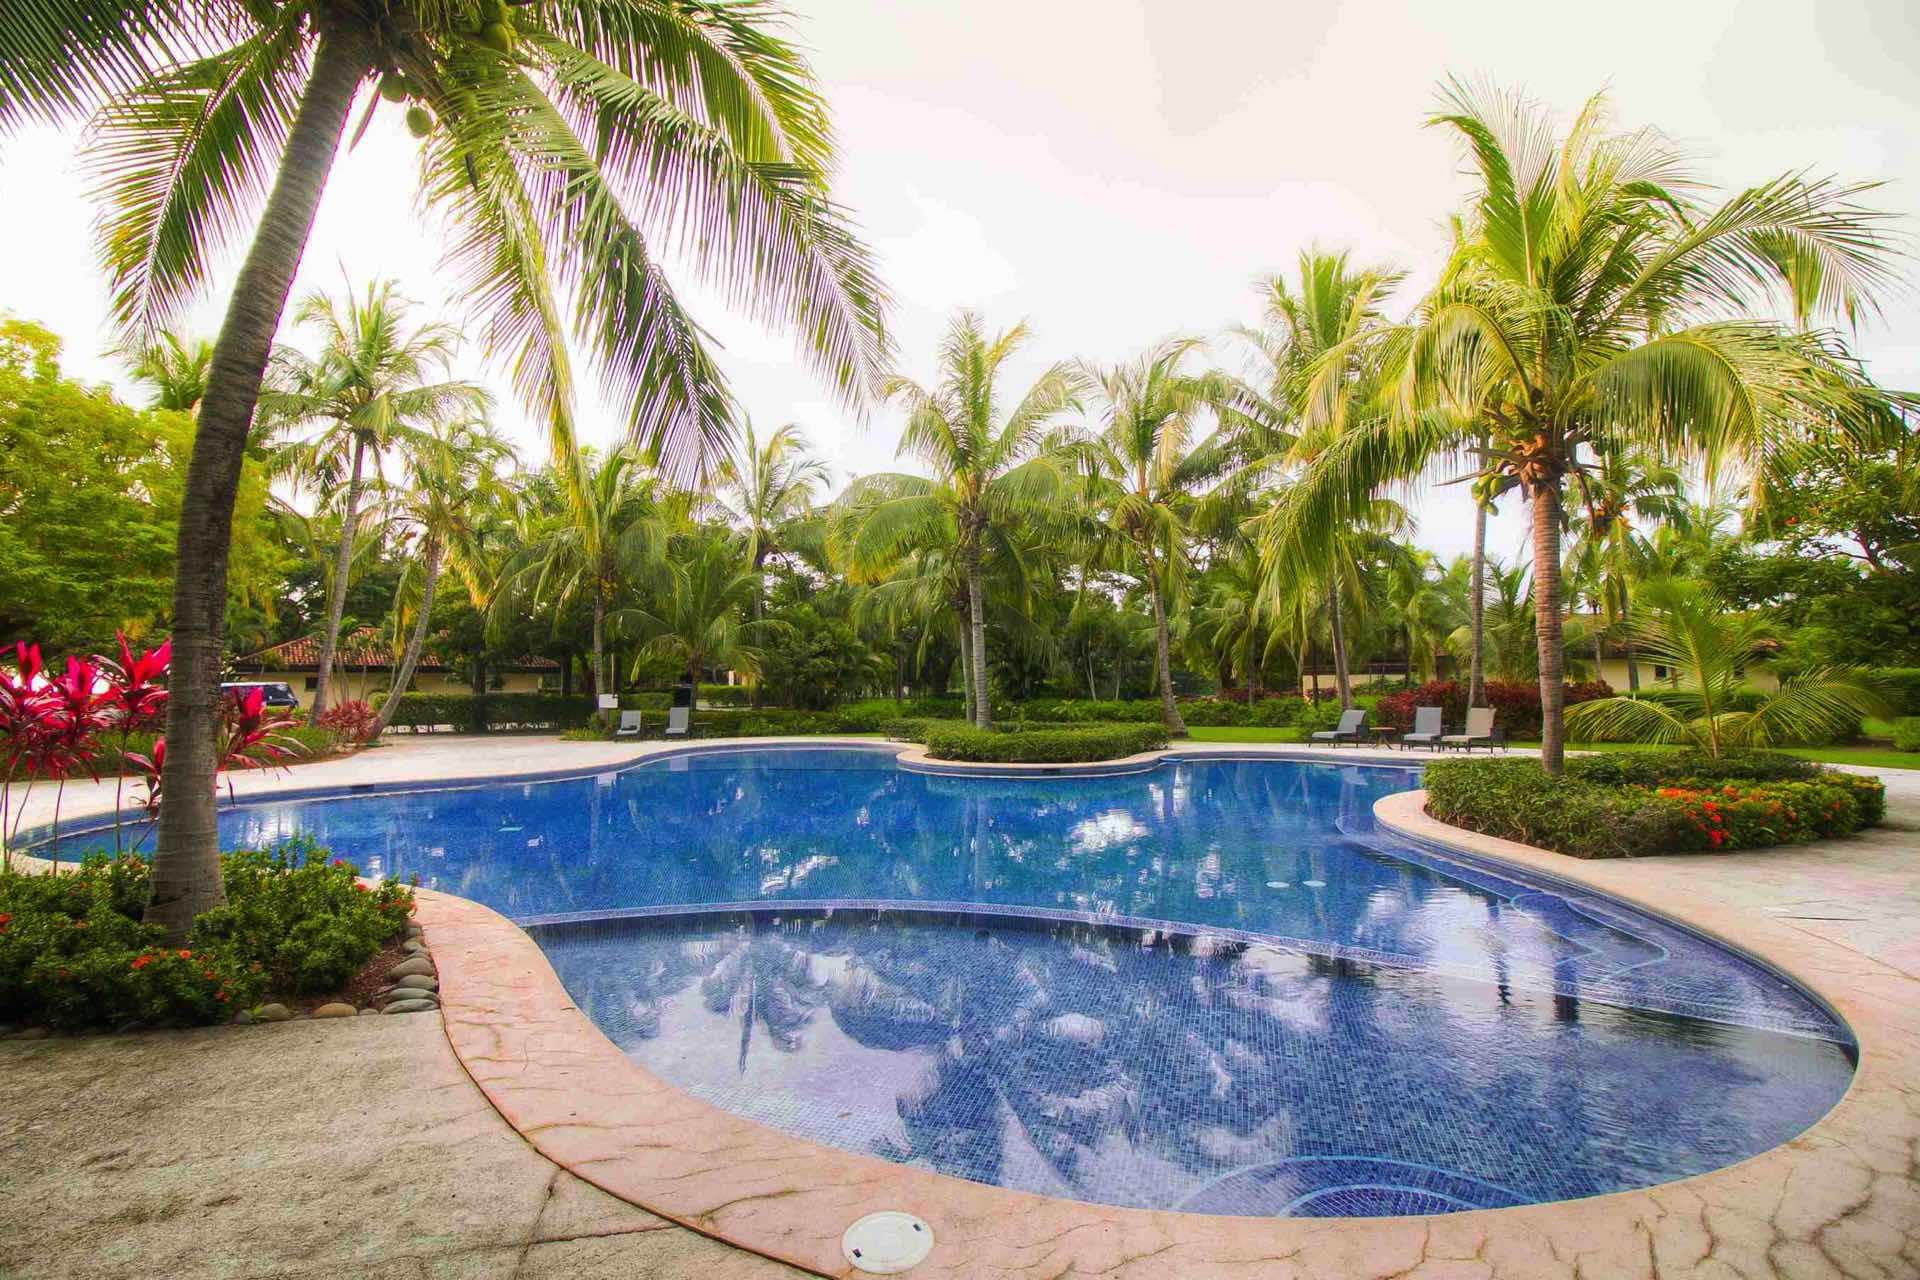 At Villa Mansita, this custom pool is yours to enjoy